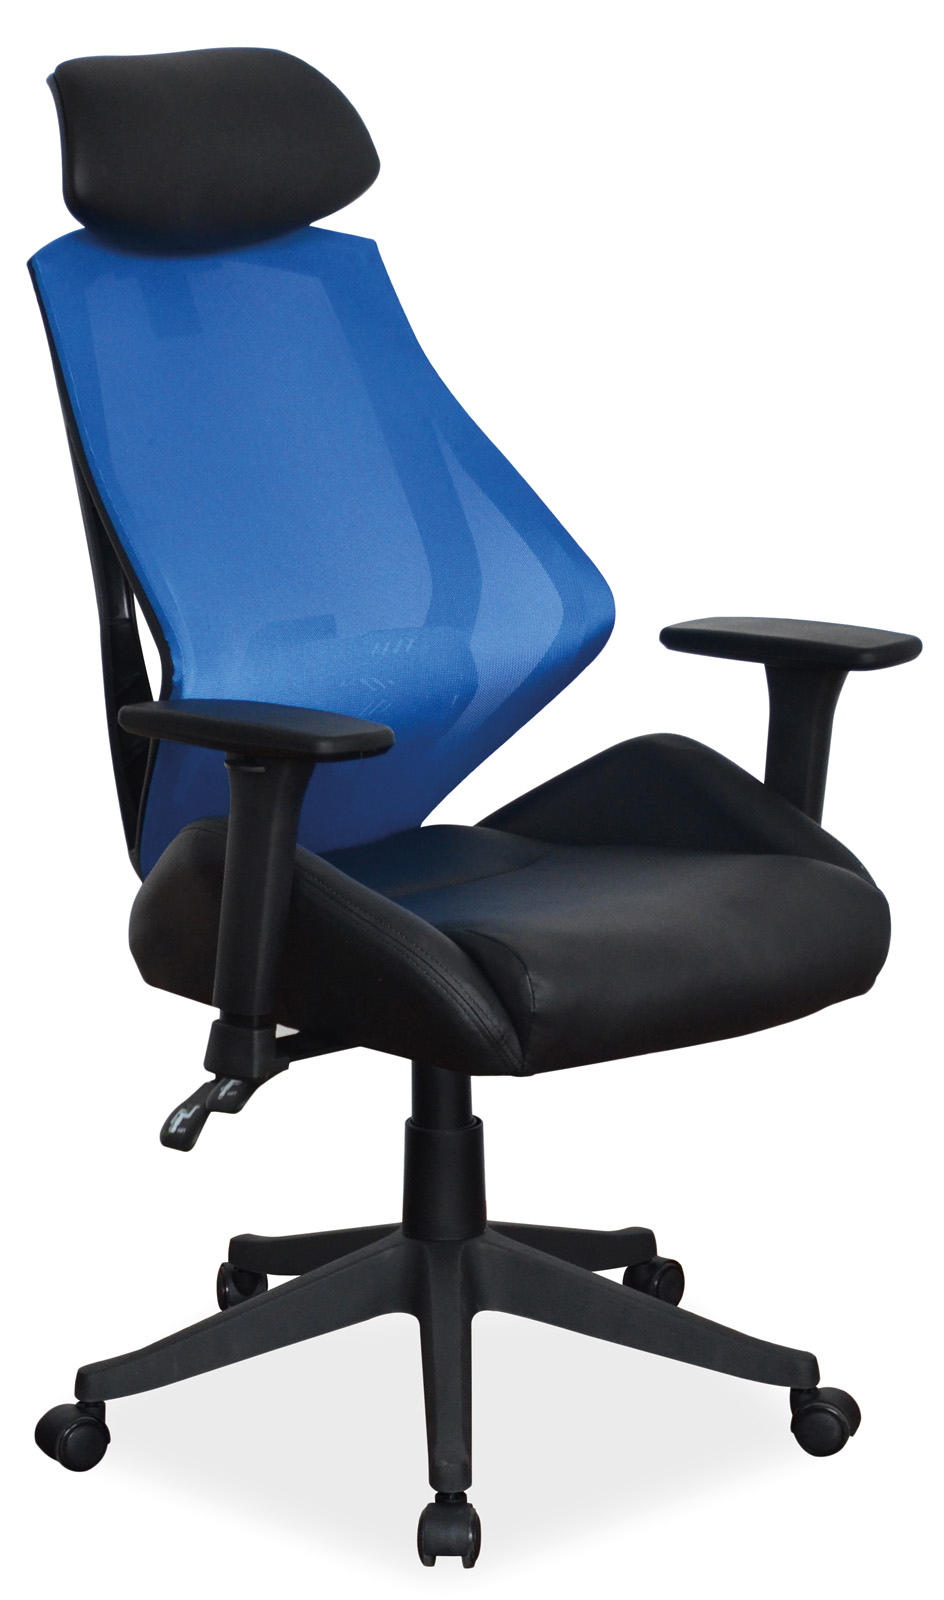 Scaun de birou ergonomic Q-406 Blue / Black